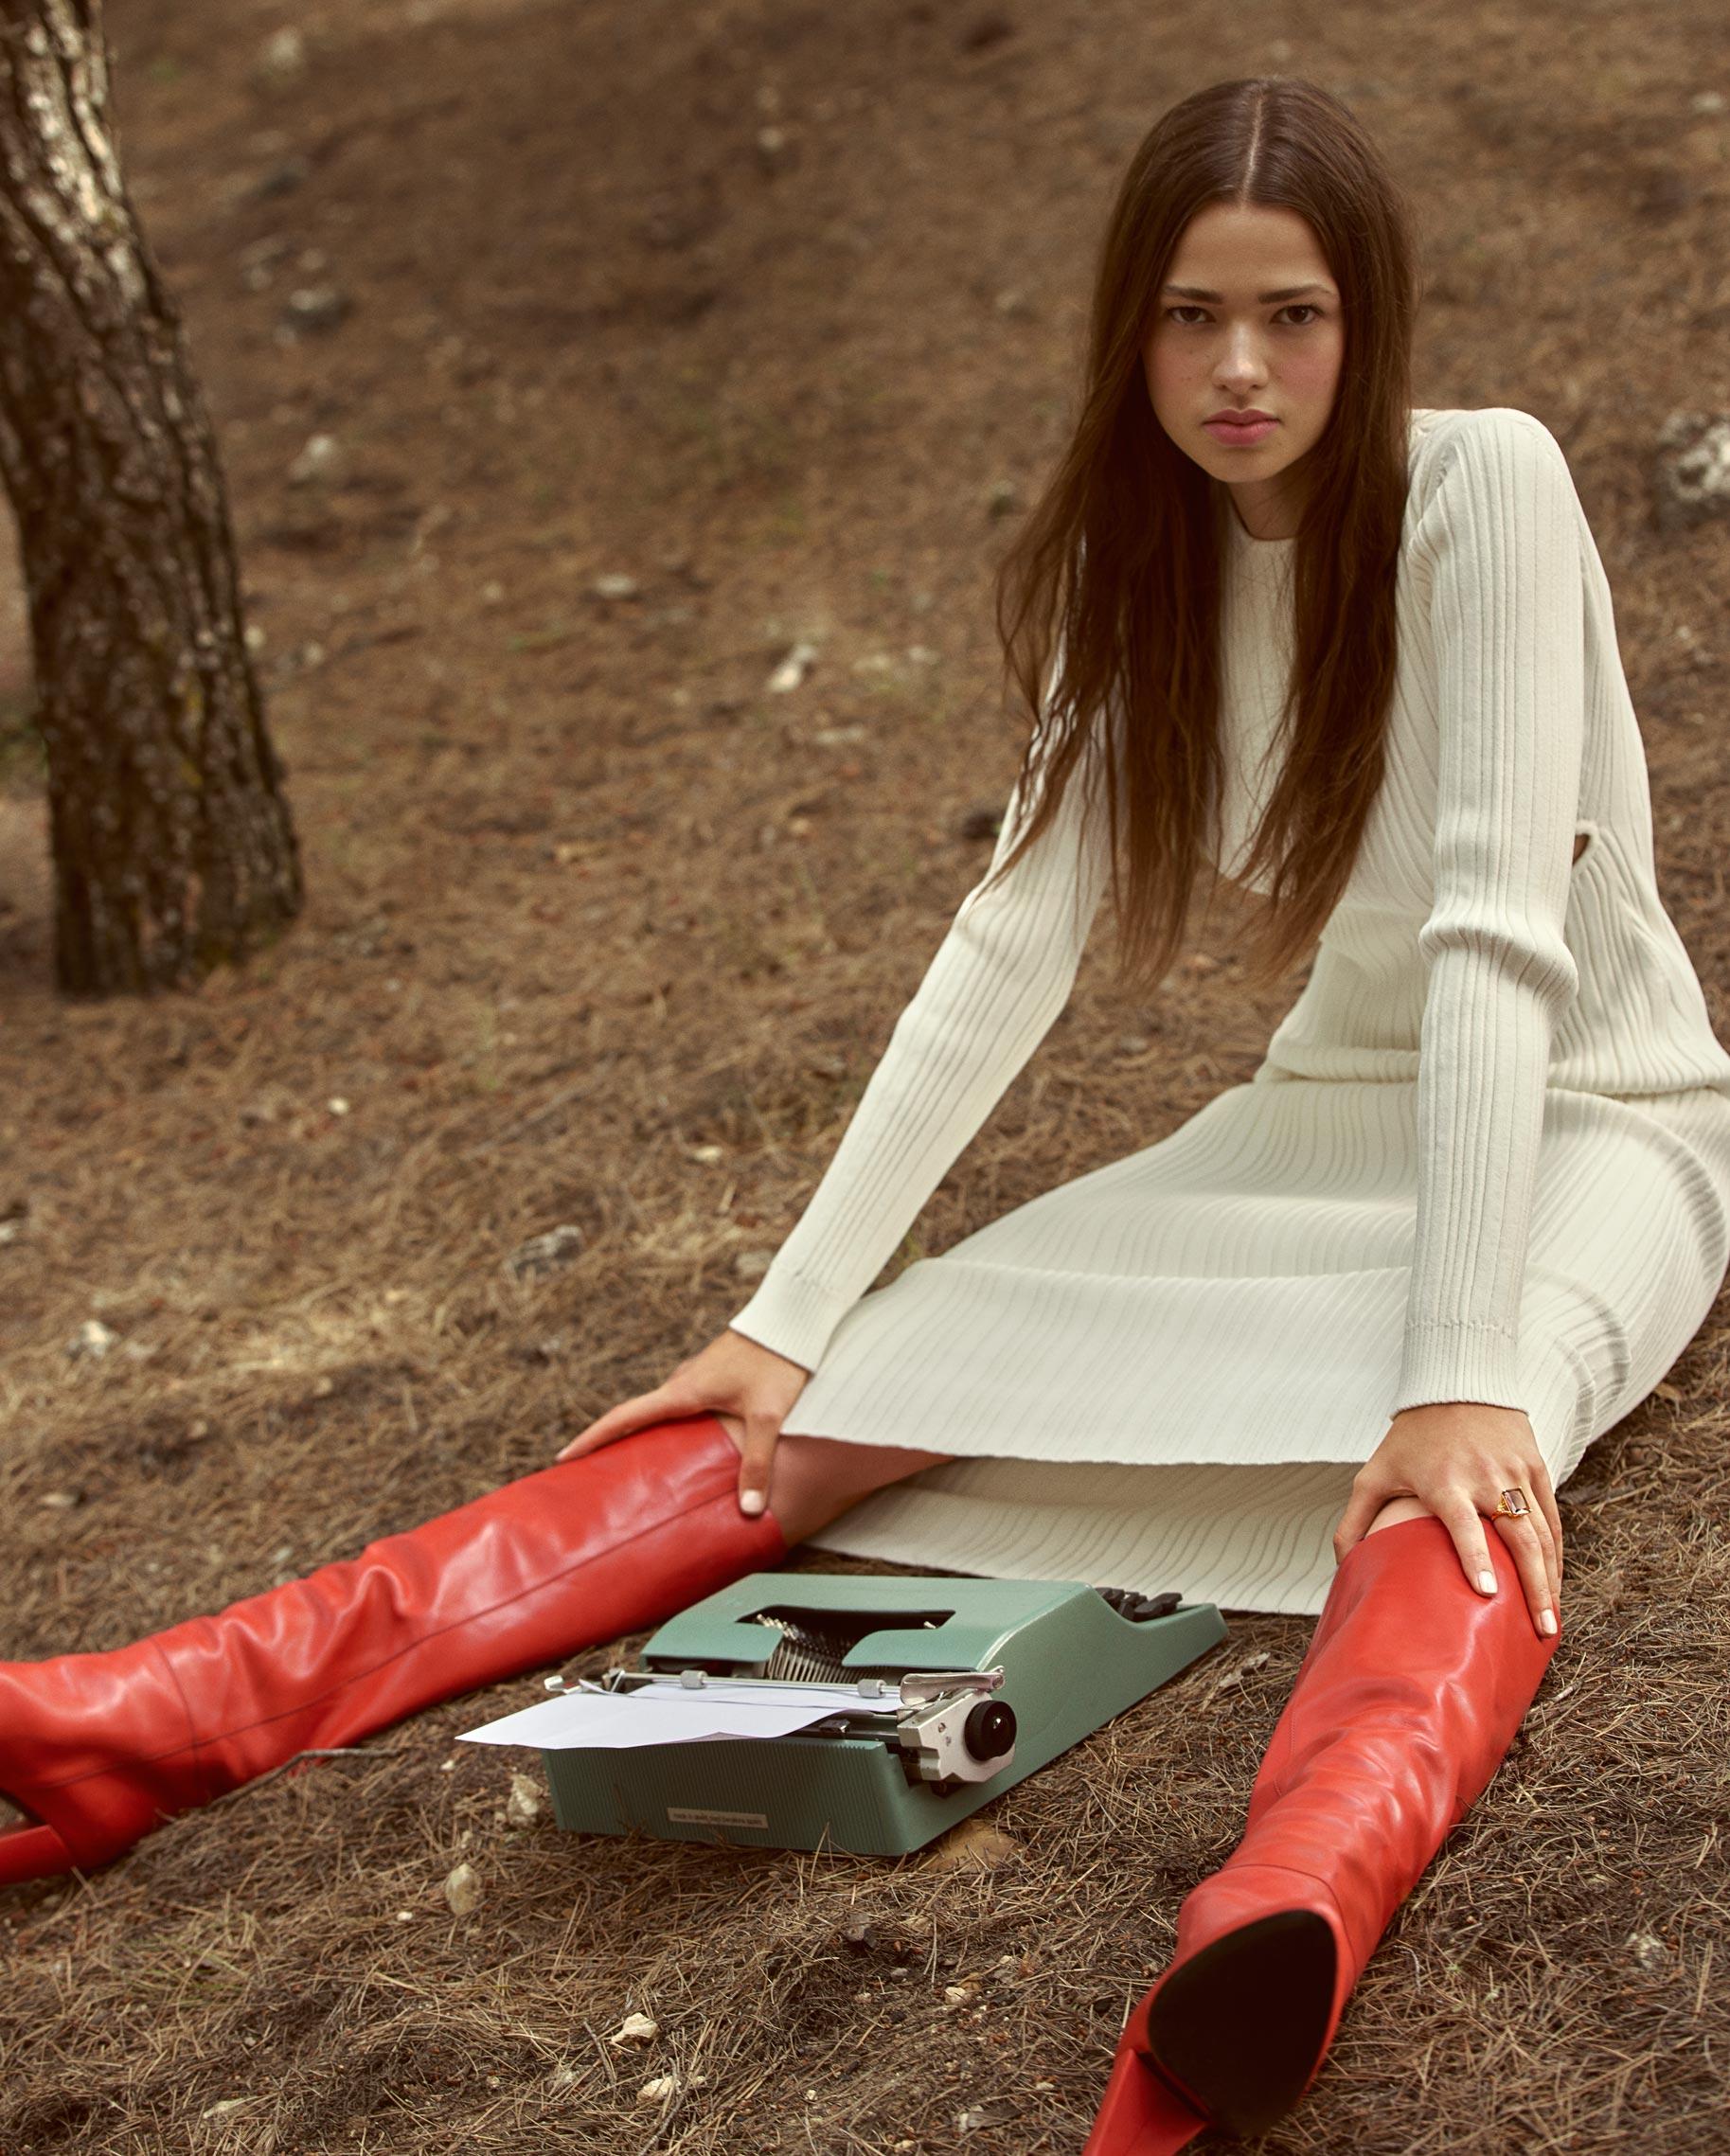 Диана Свиридова в лесу демонстрирует винтажную технику и новинки моды / фото 06